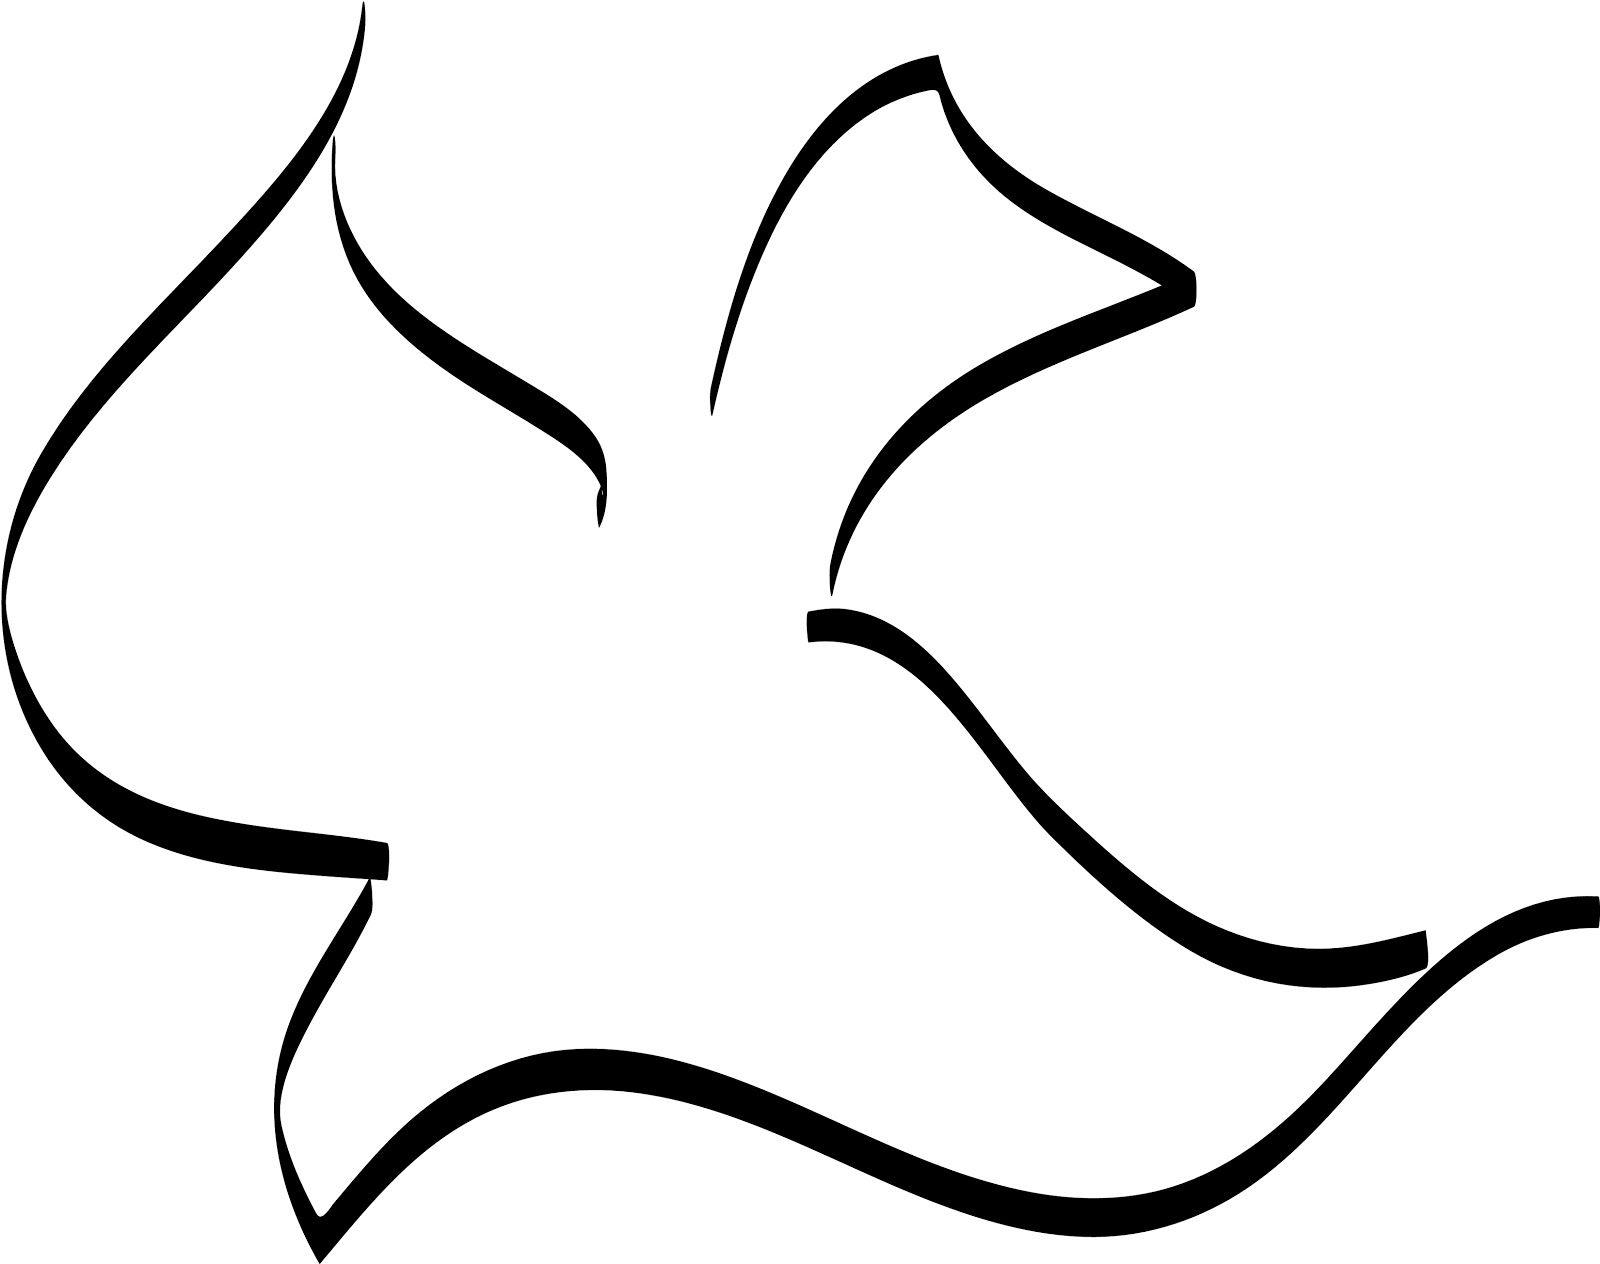 Holy spirit dove symbol google search tattoo pinterest holy spirit dove symbol google search tattoo pinterest symbols tattoo and tatting biocorpaavc